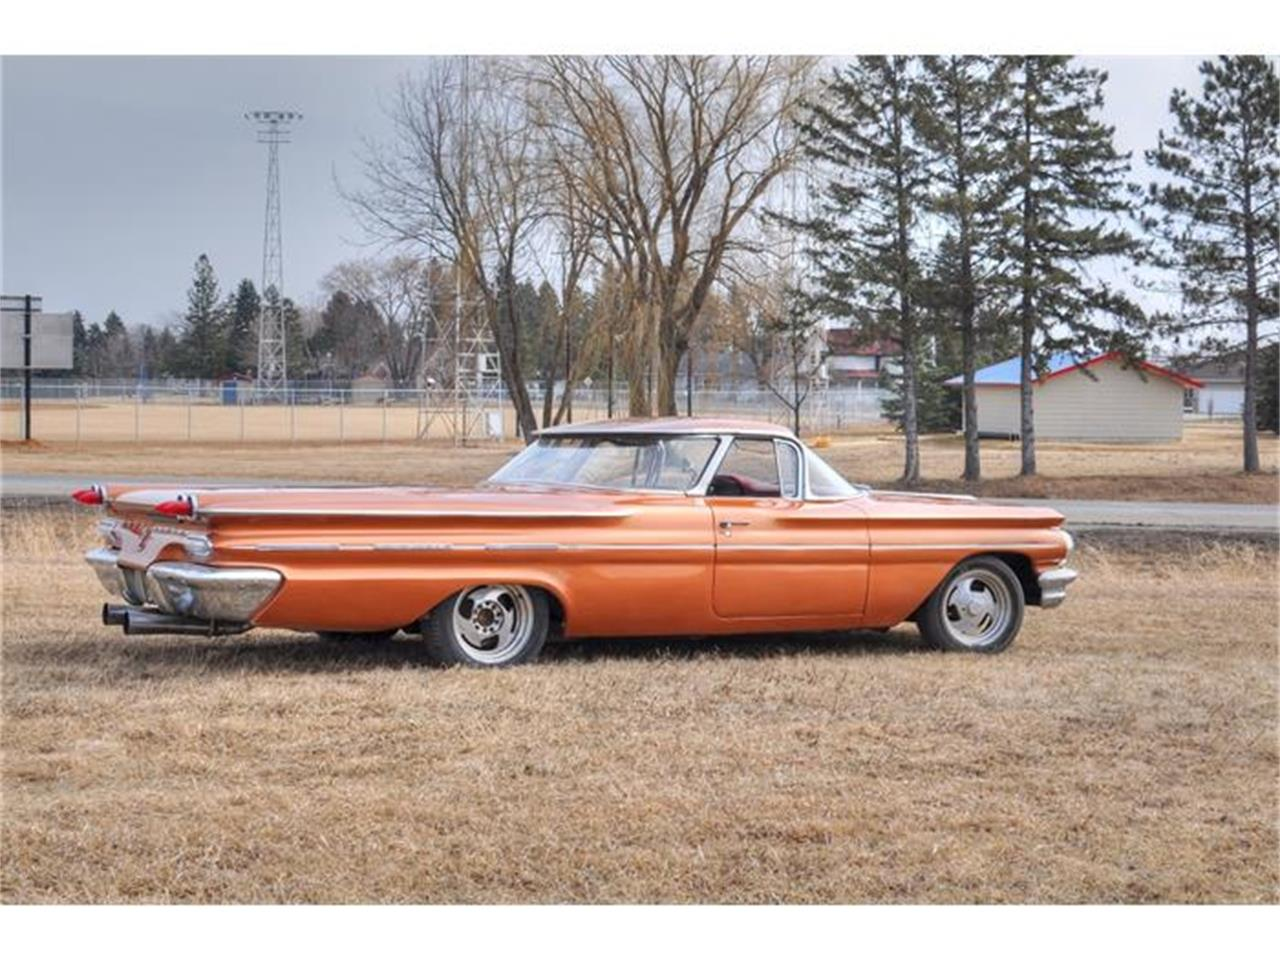 Hooked On Classic Cars Minnesota